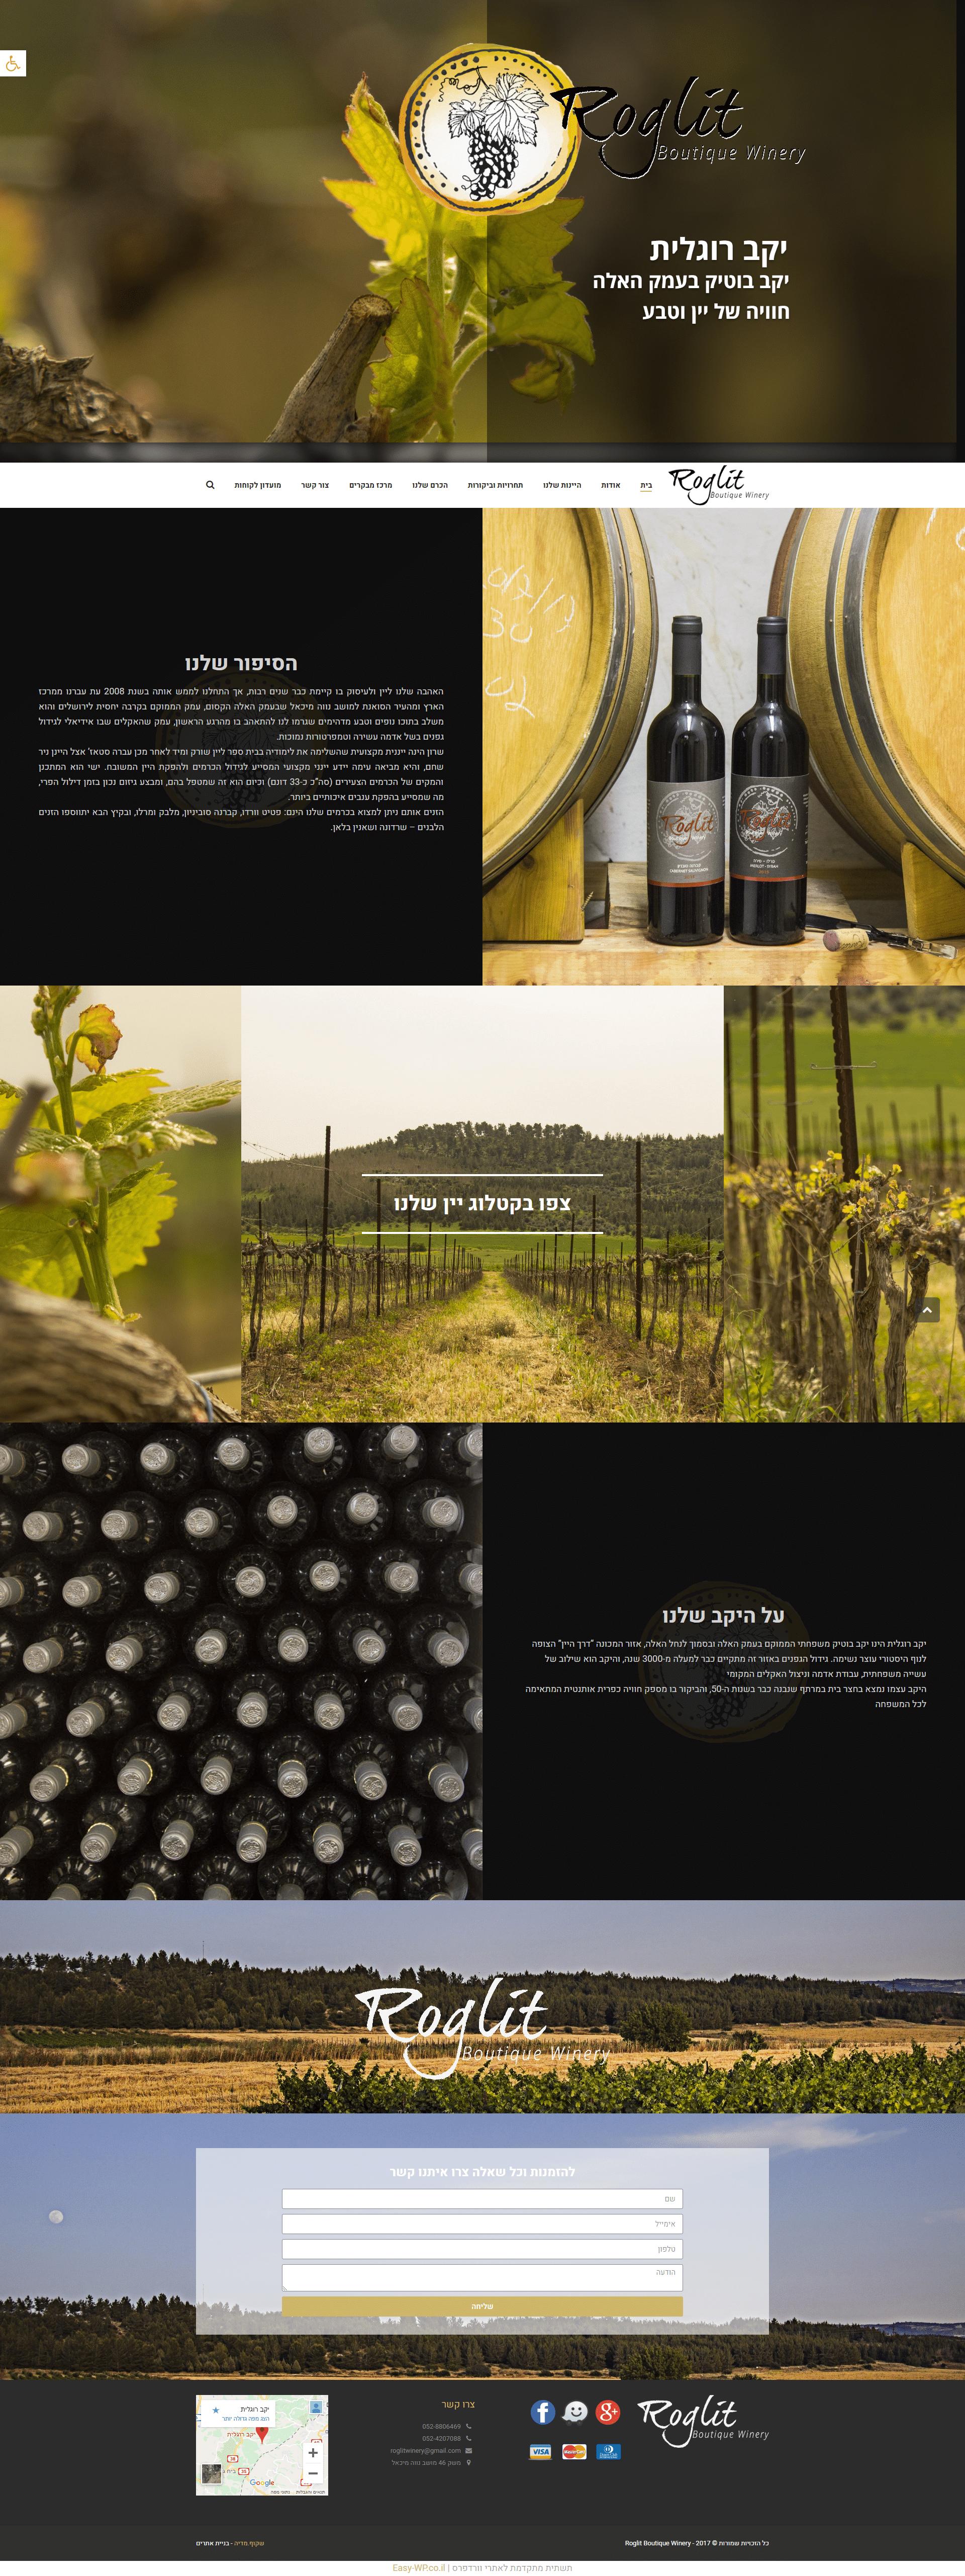 1roglit-winery.co.il